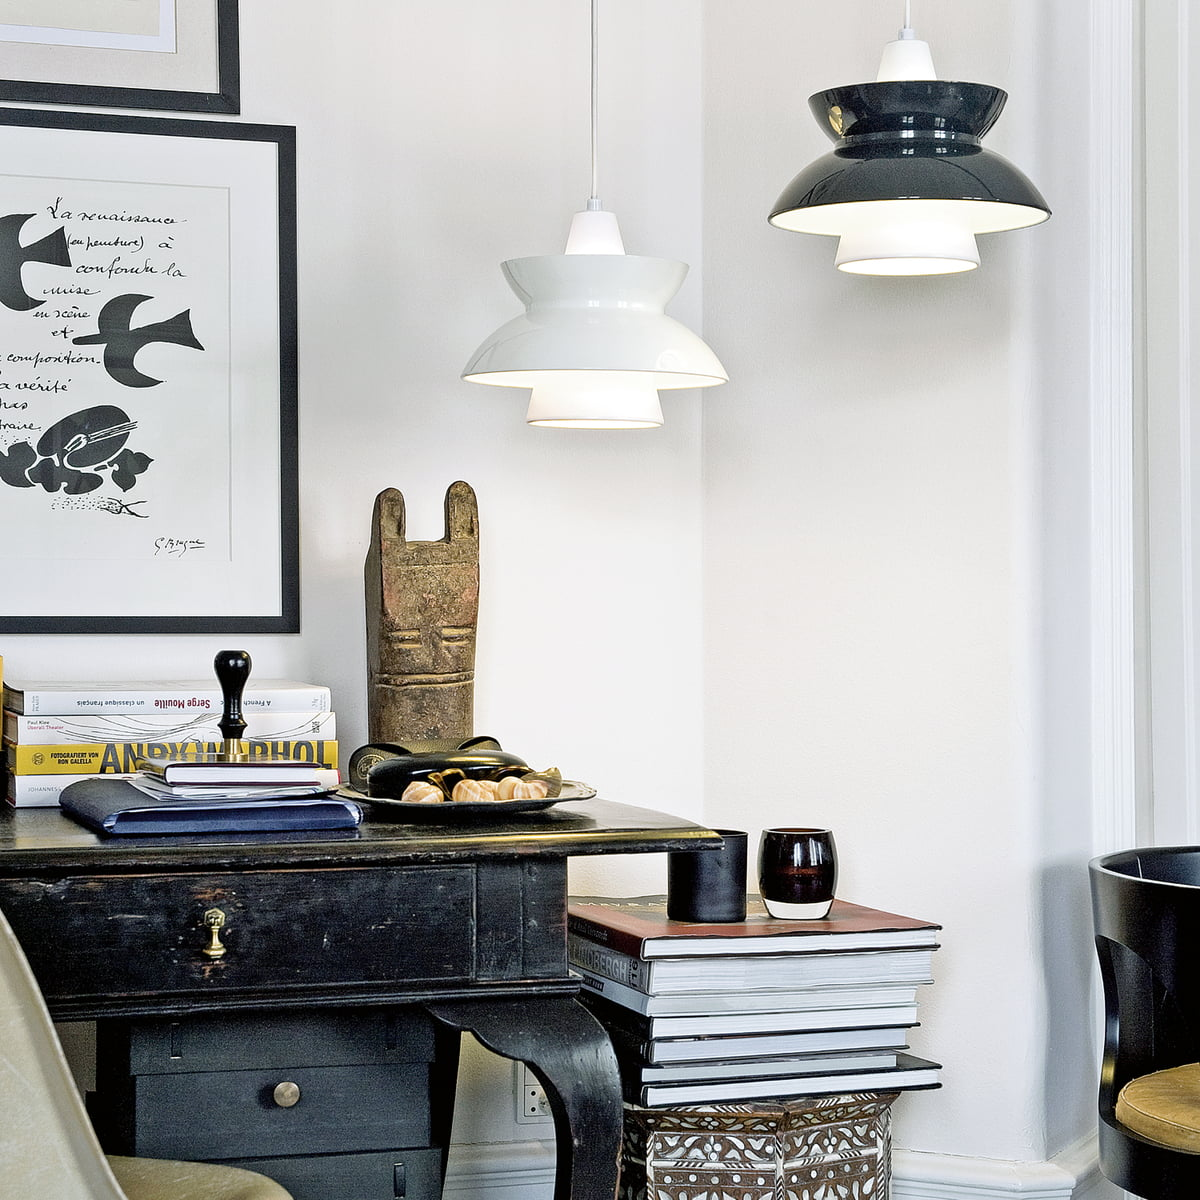 doowop pendelleuchte von louis poulsen kaufen. Black Bedroom Furniture Sets. Home Design Ideas